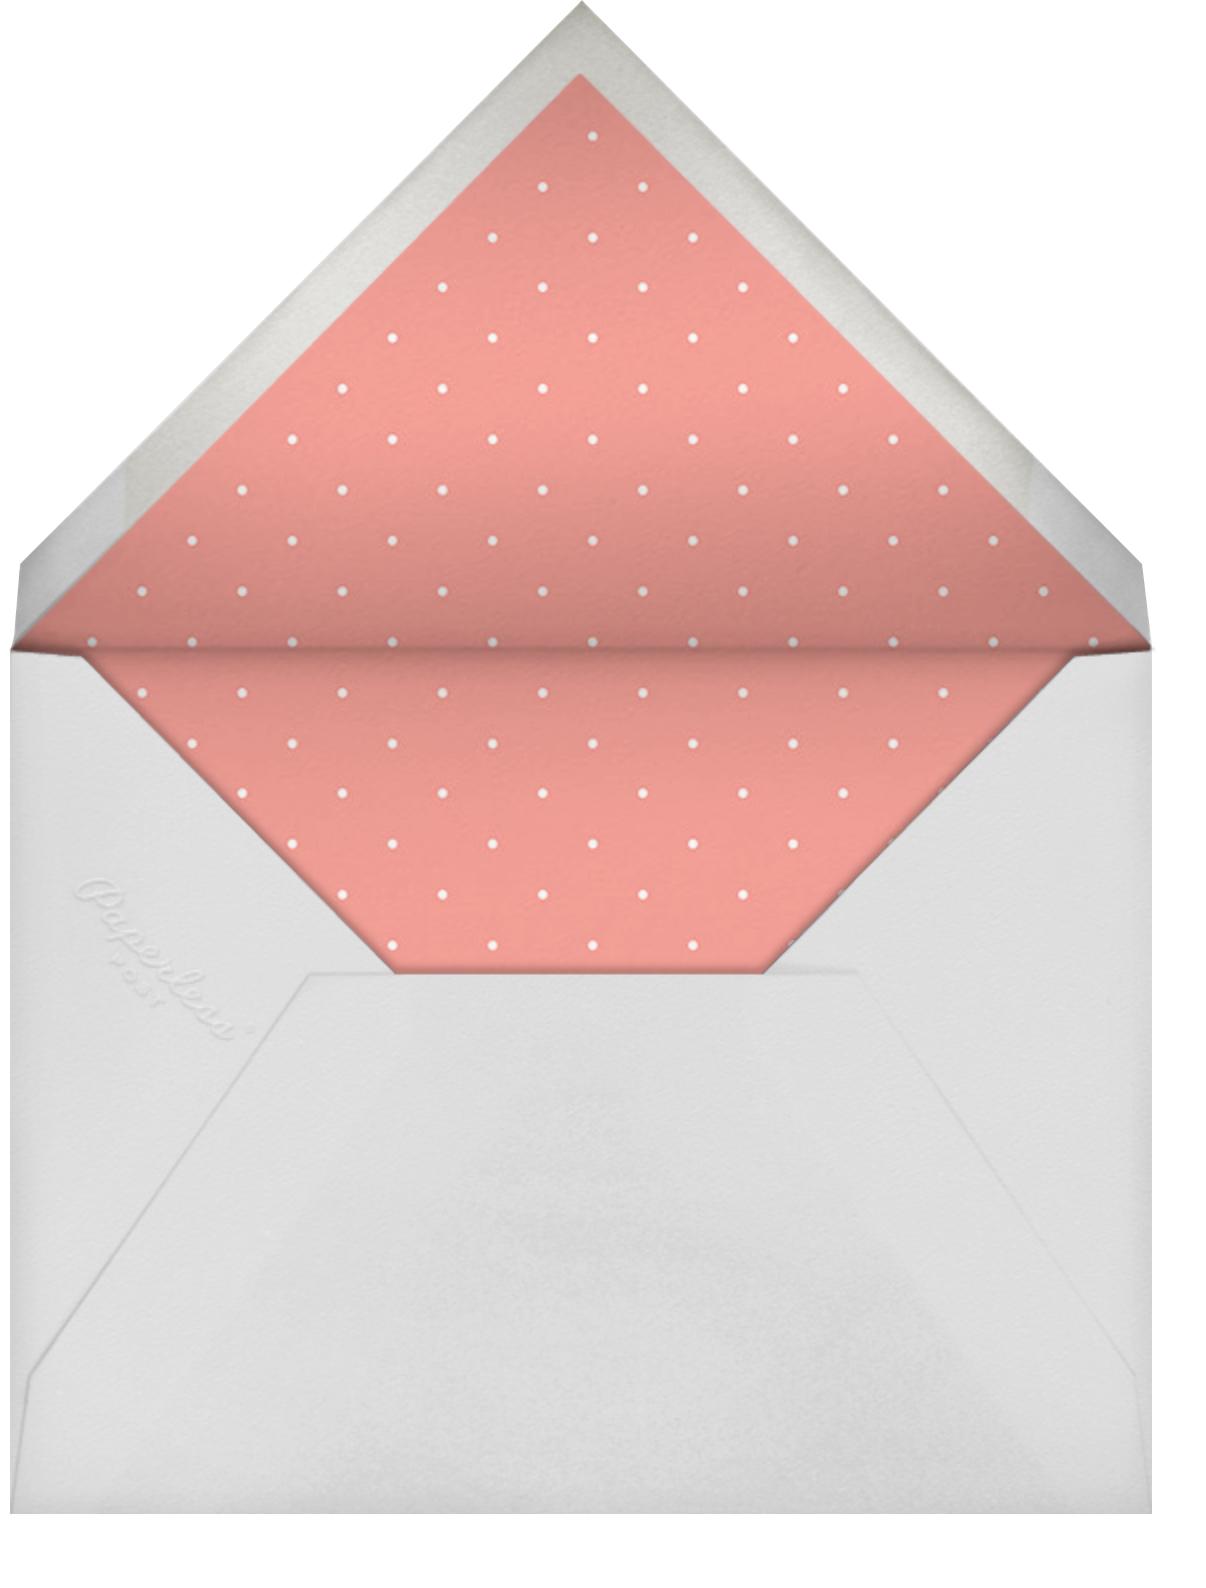 Oh Lovely Day - Rose - Mr. Boddington's Studio - Engagement party - envelope back